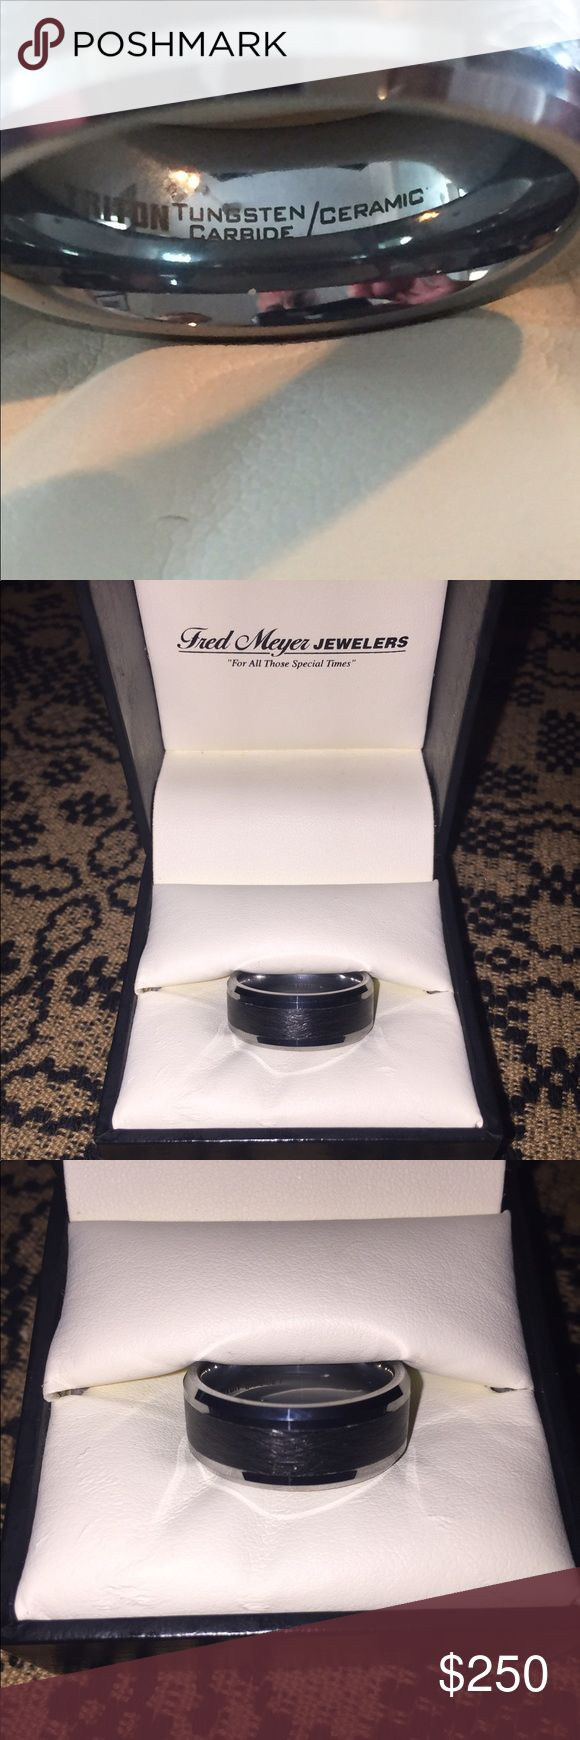 Tungsten wedding band ring NEW NEVER WORN Size 10.5 Mens wedding band. TRITON Tungsten carbide/ceramic. Accessories Jewelry